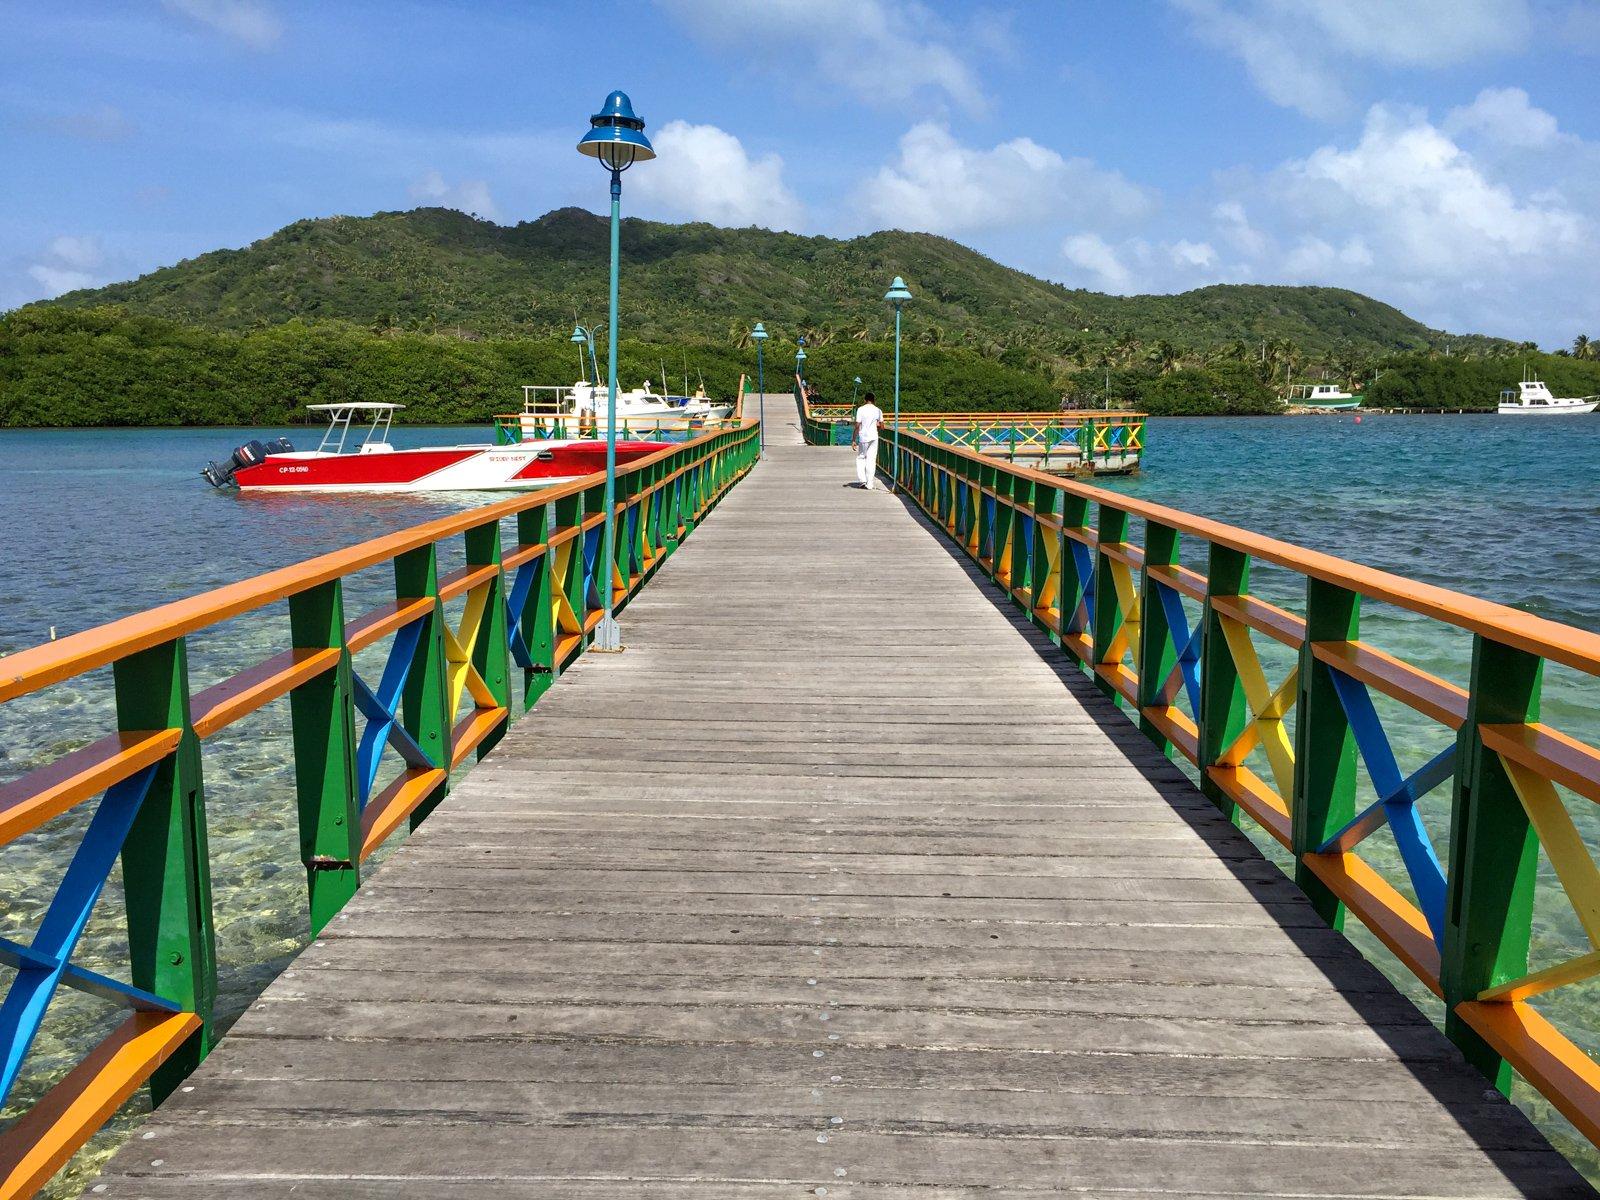 Boardwalk connecting Providencia and Santa Catalina islands